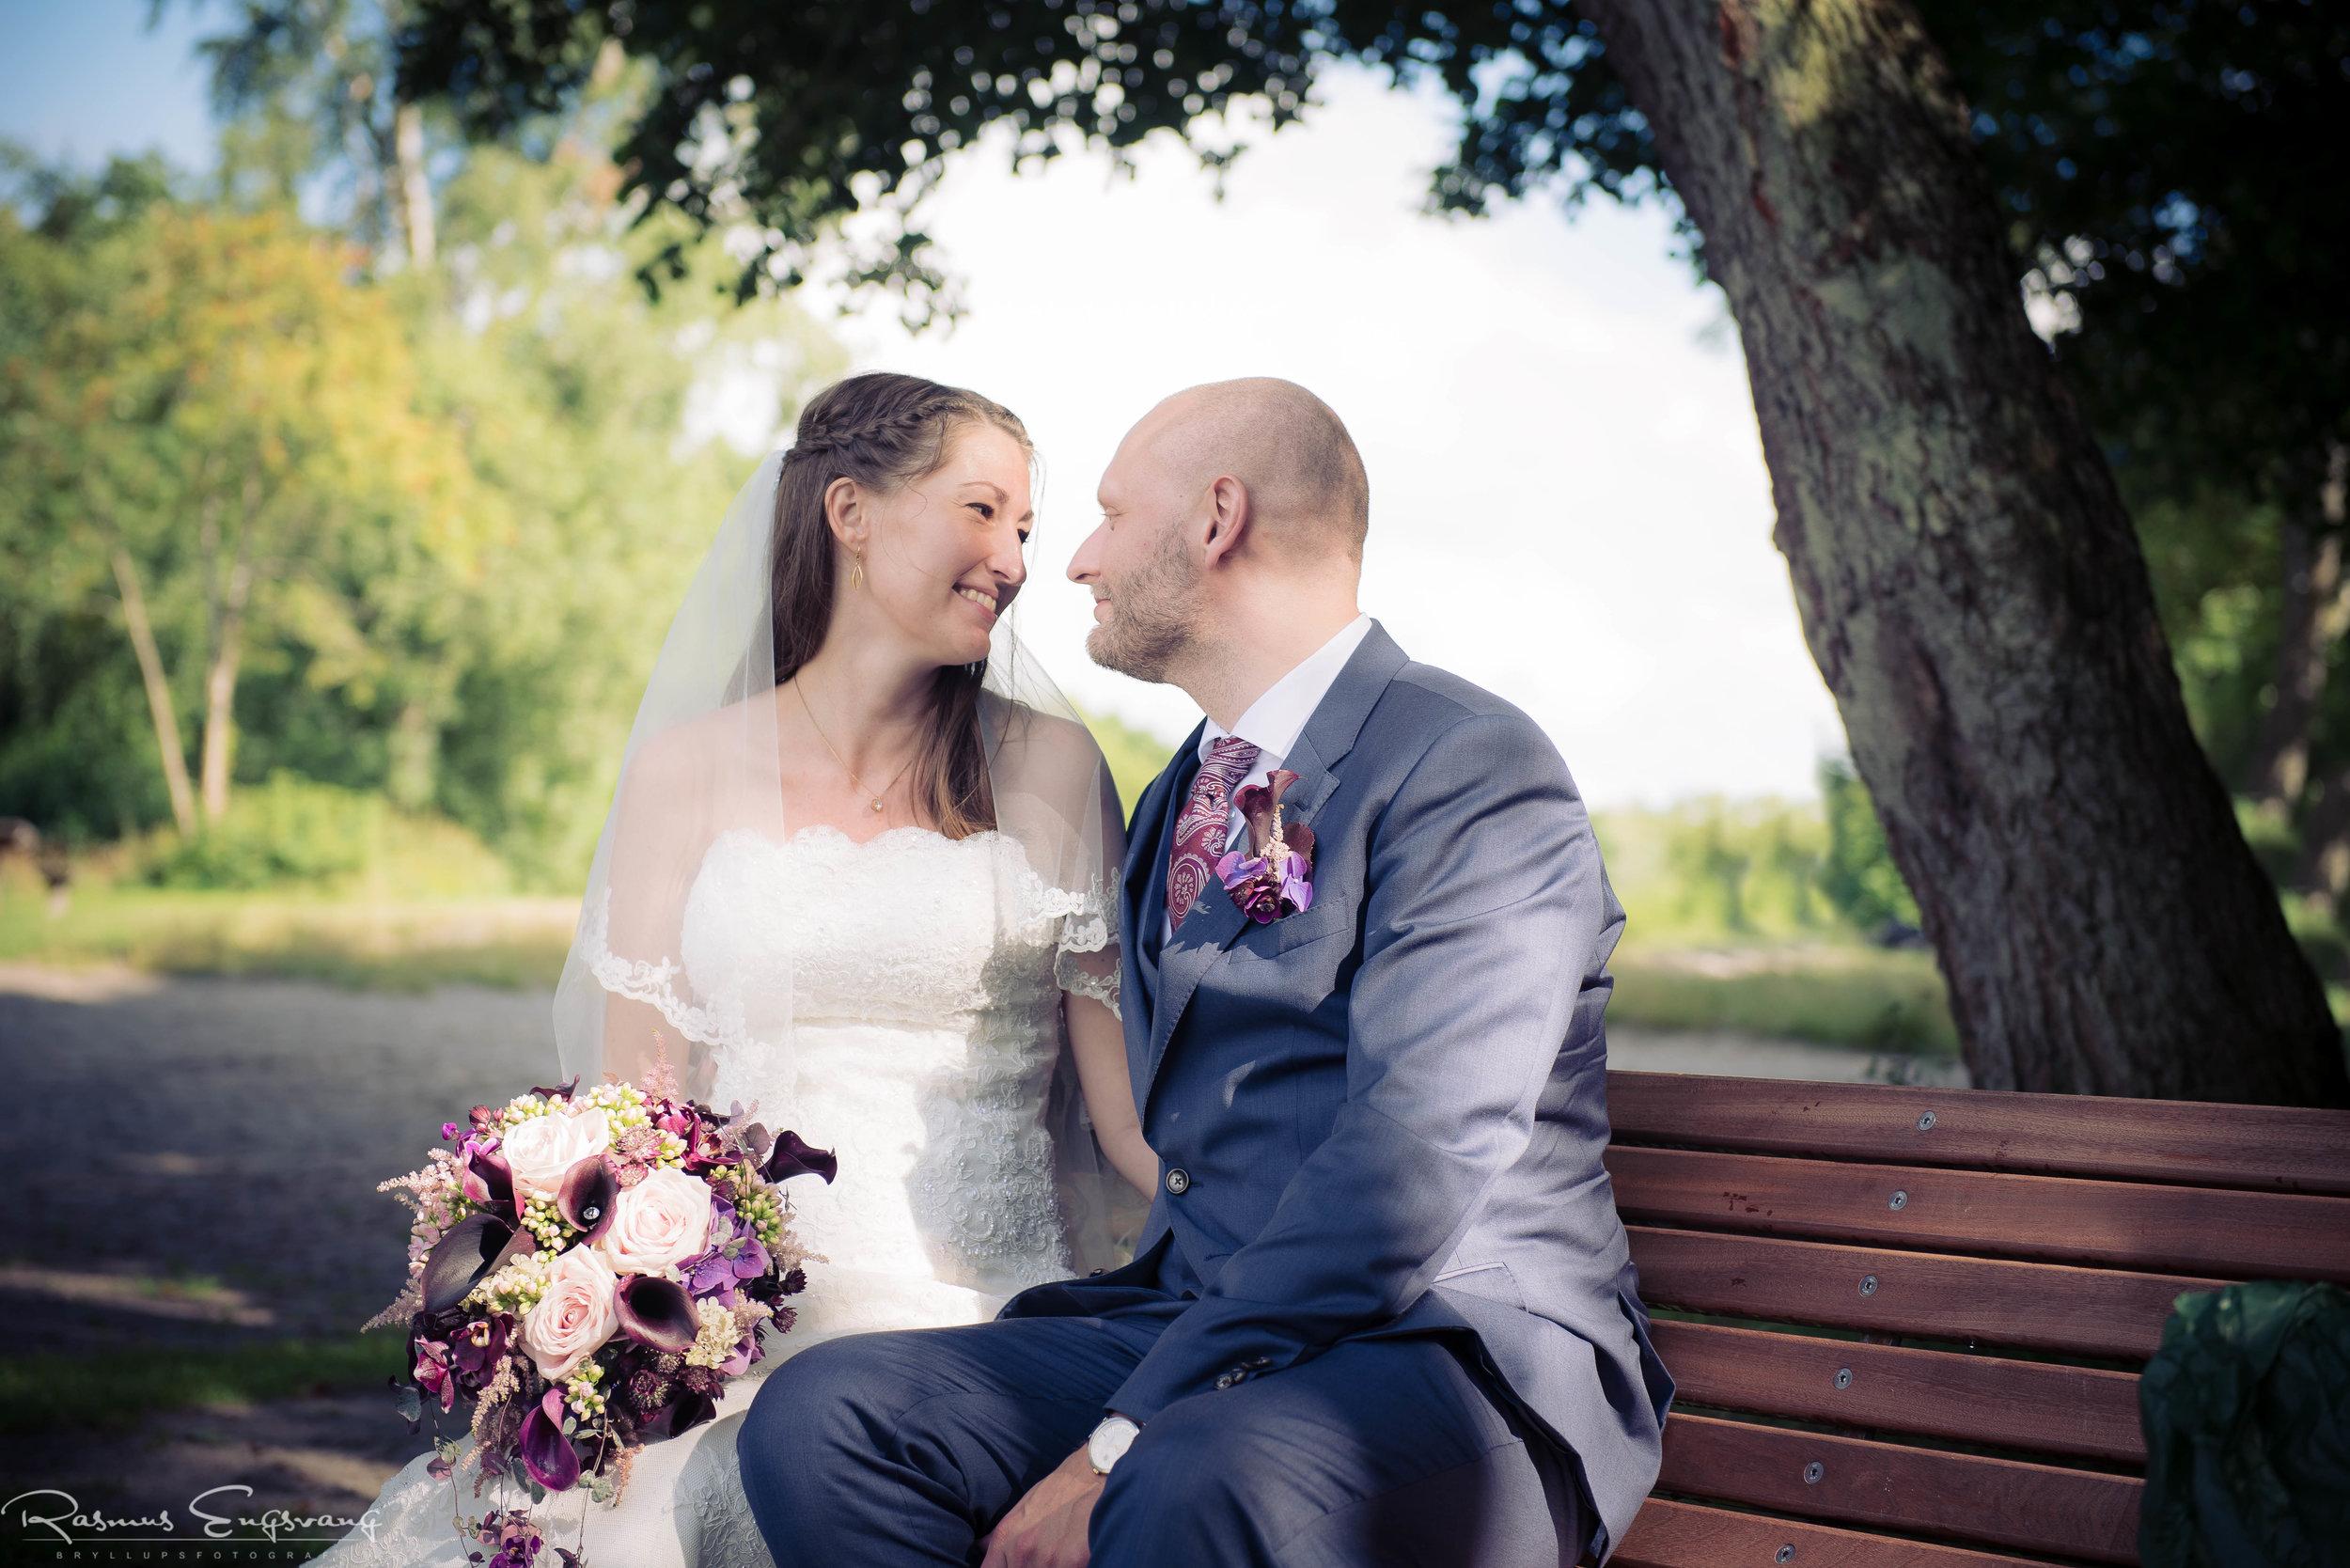 Bryllupsfotograf-København_Sjælland-Ølstykke-Buresø-204.jpg